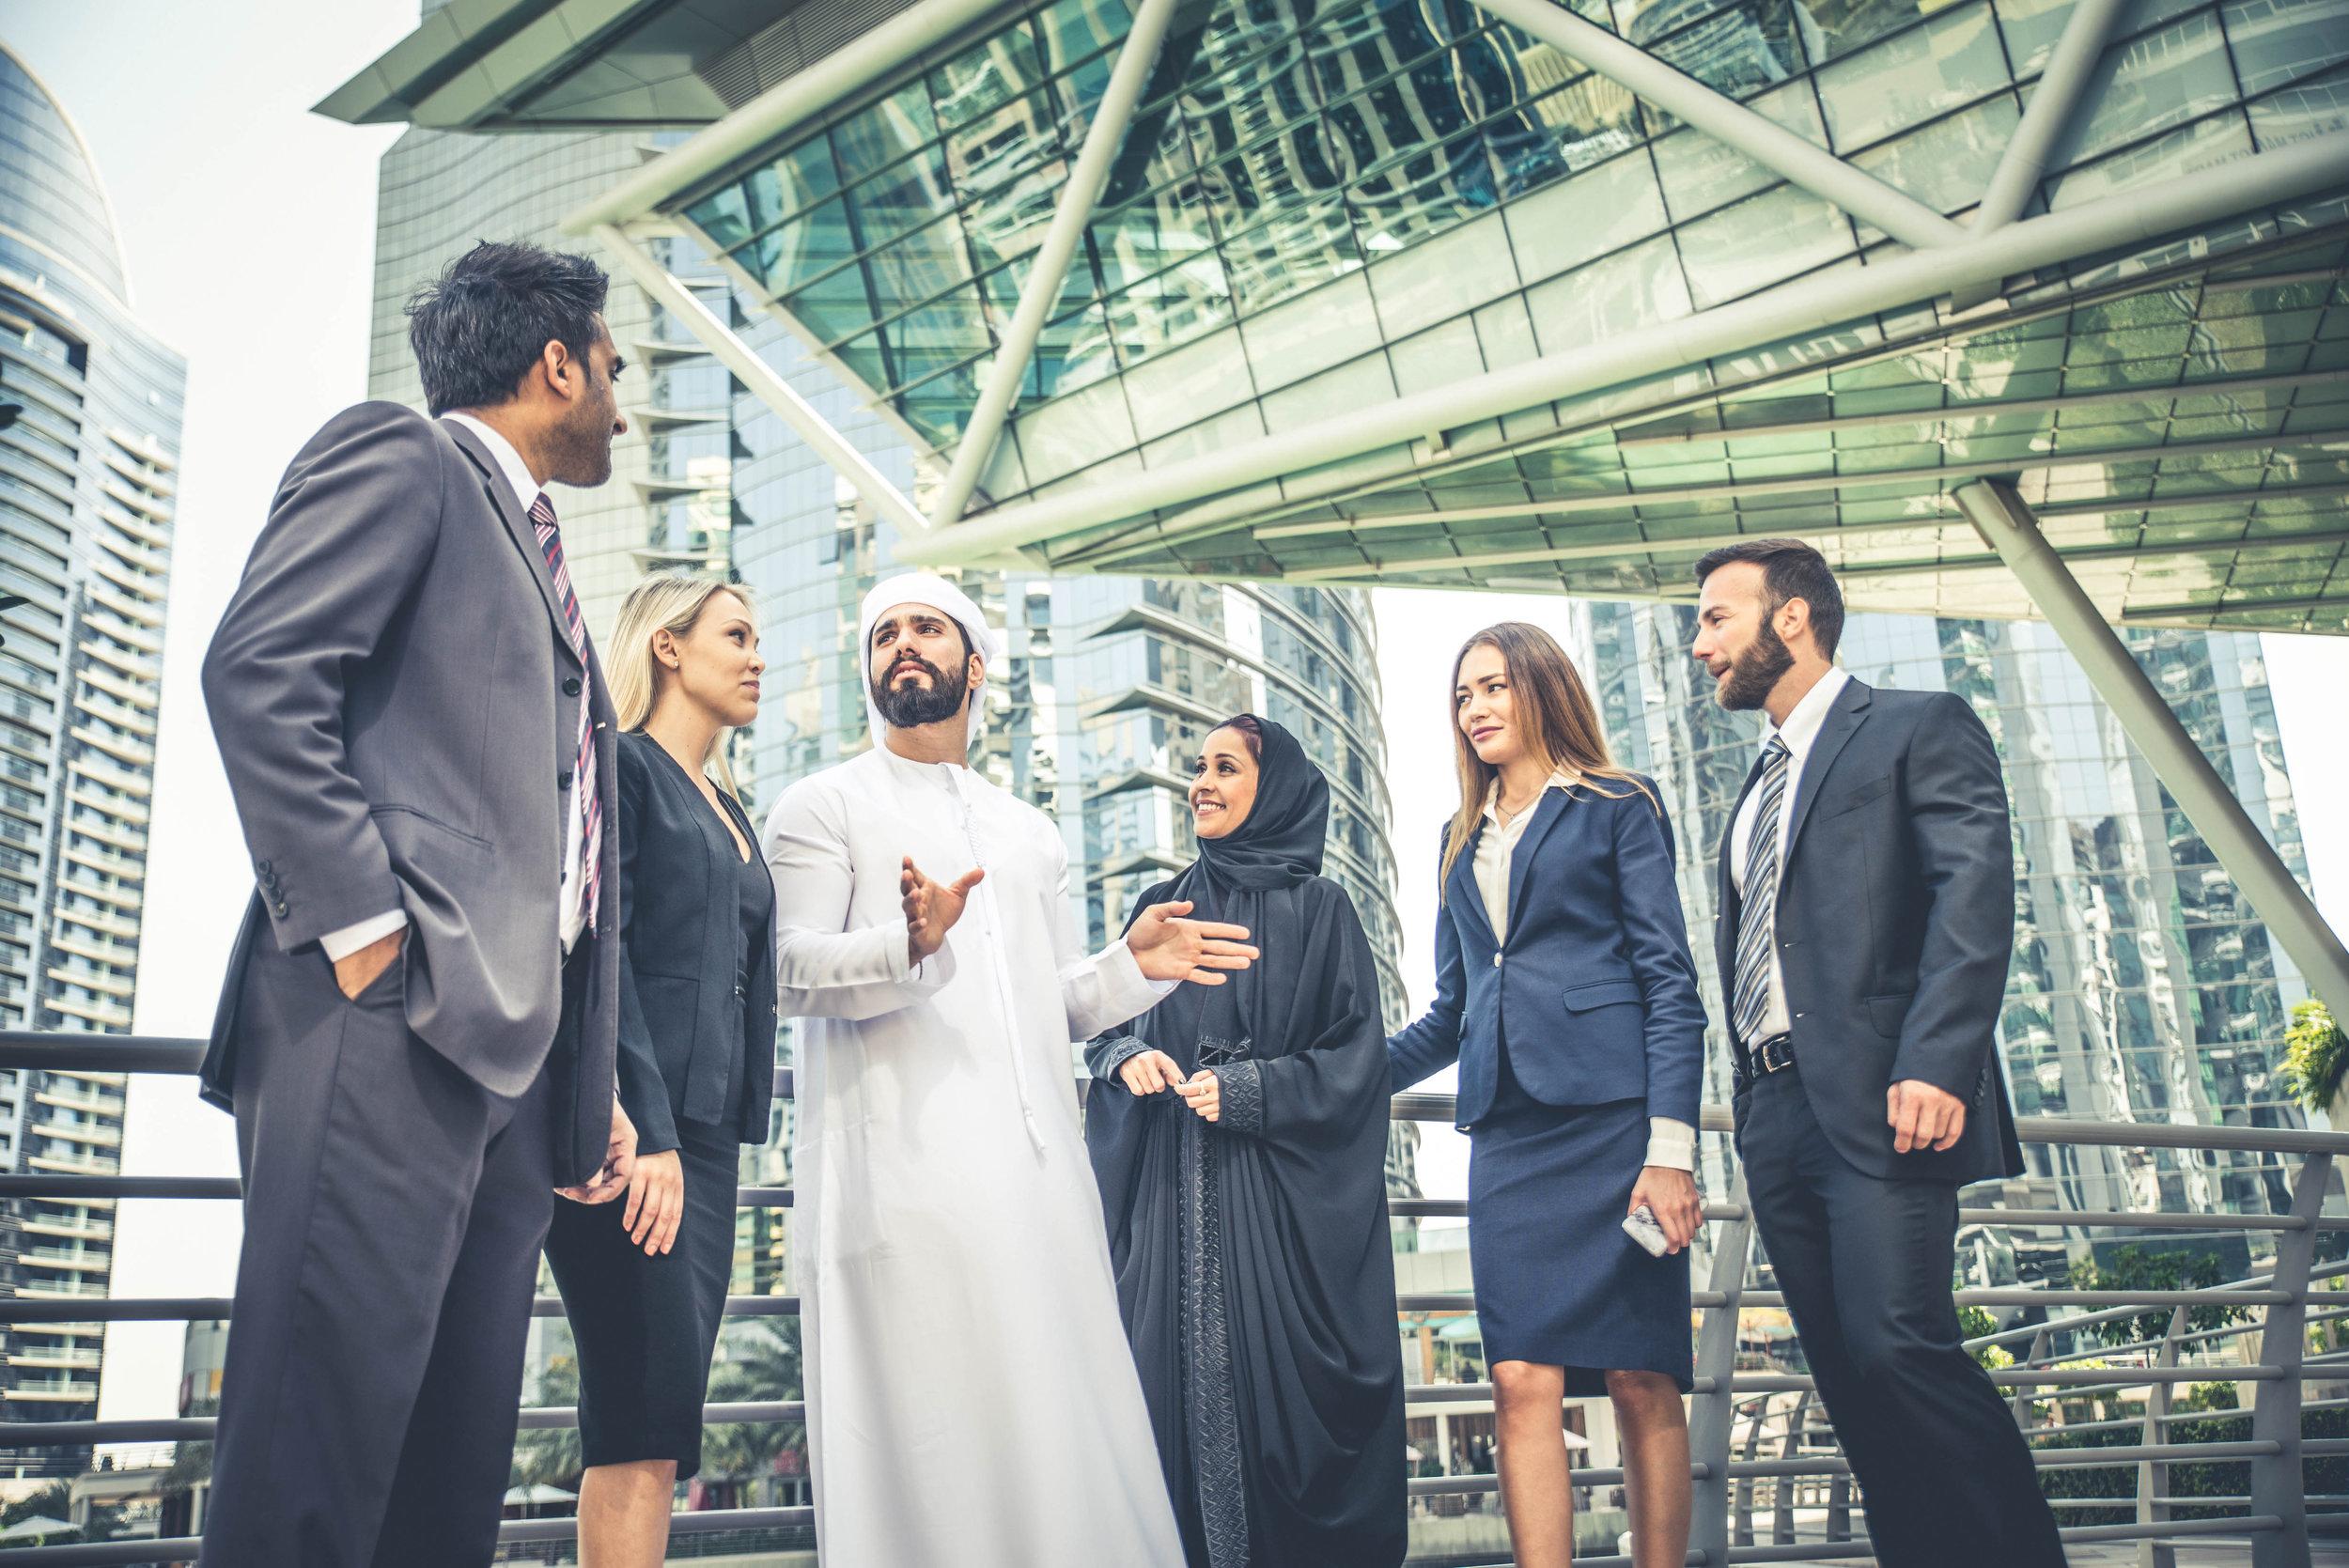 bigstock-Business-People-In-Dubai-220723663.jpg